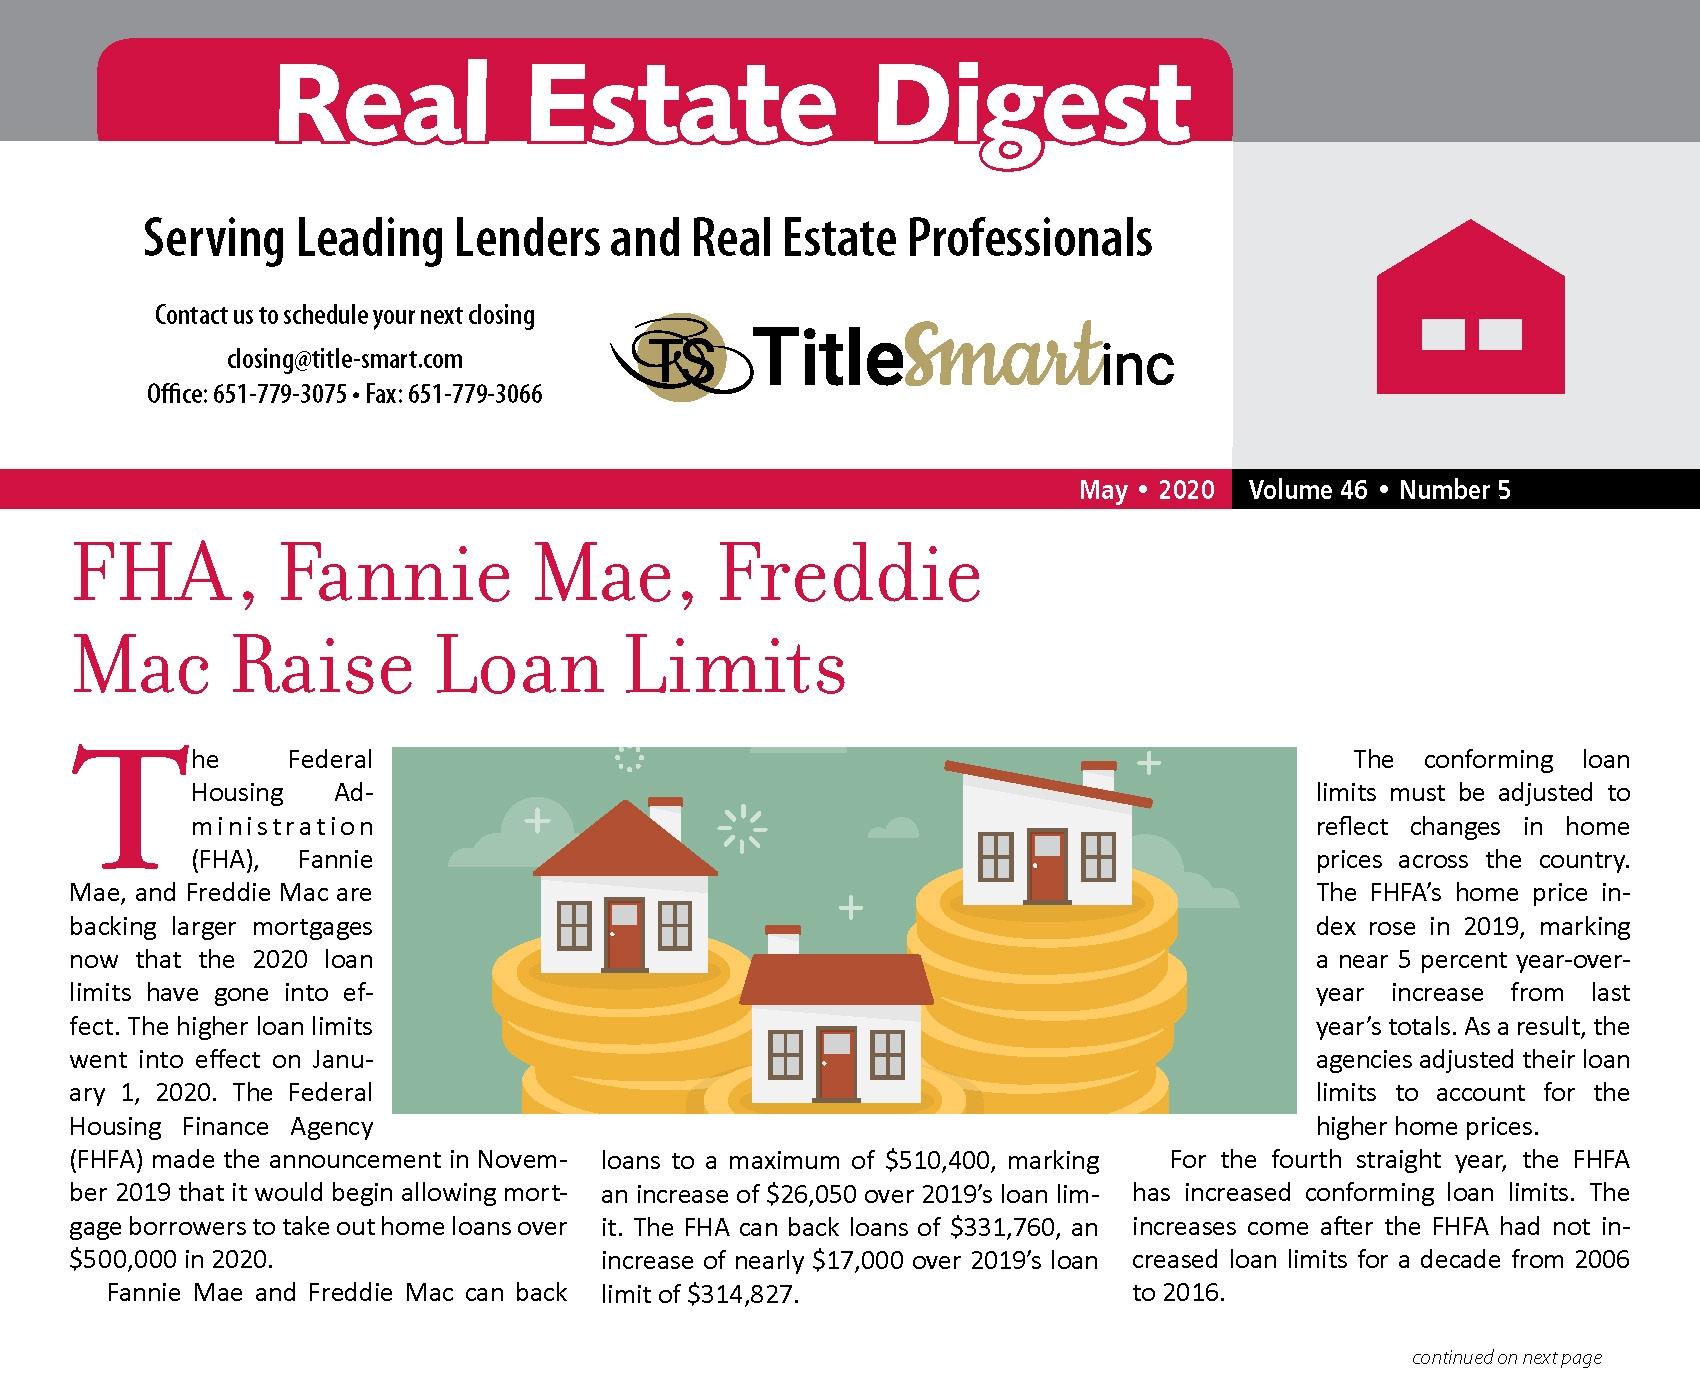 FHA, Fannie Mae, Freddie Mac Raise Loan Limits